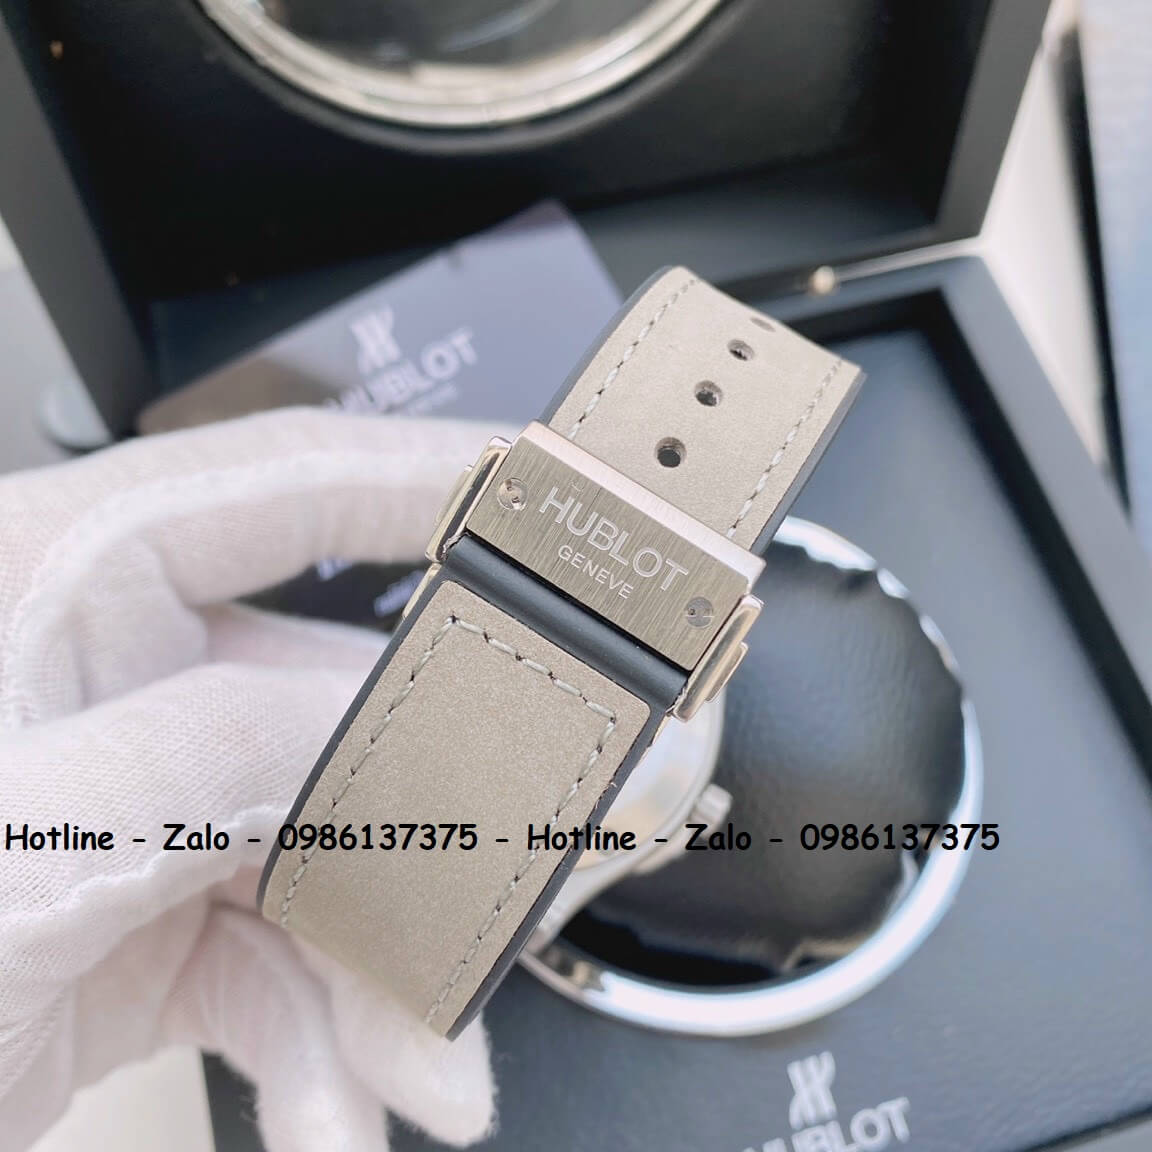 Đồng Hồ Hublot Automatic Nam Dây Da Silicon Xám 42mm